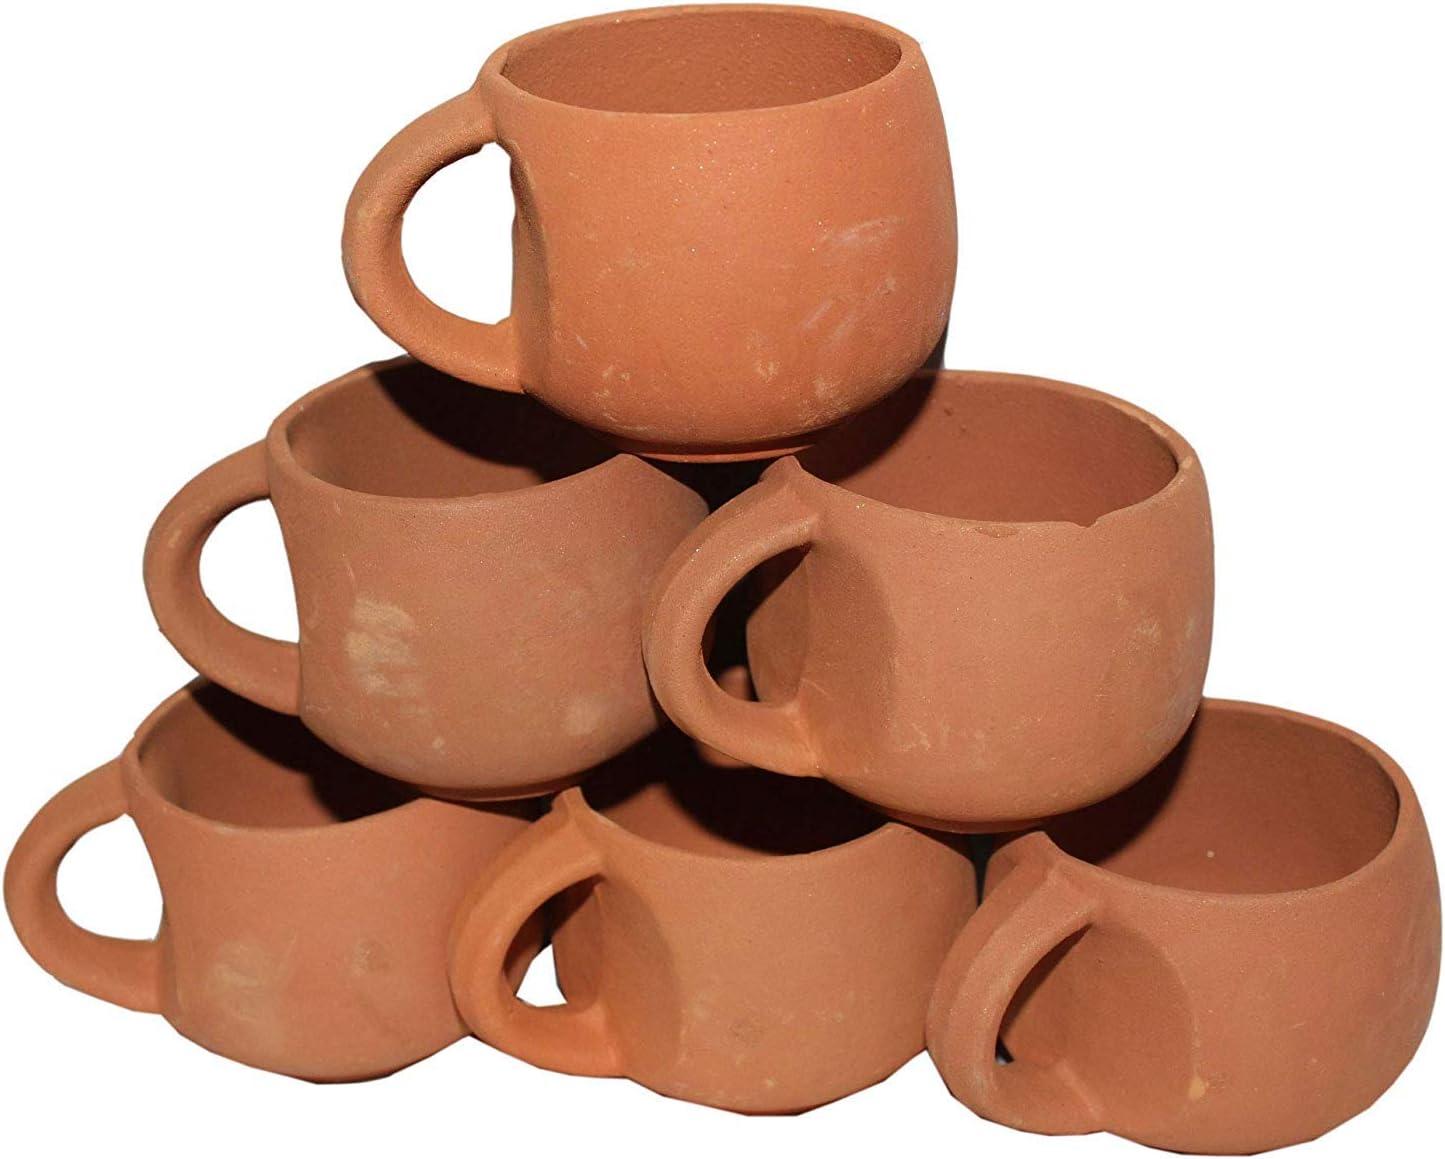 Unglazed Clay Mud Tea Cup Set of 6 Using for Tea and Coffee Odishabazaar Terracotta Real Mitti